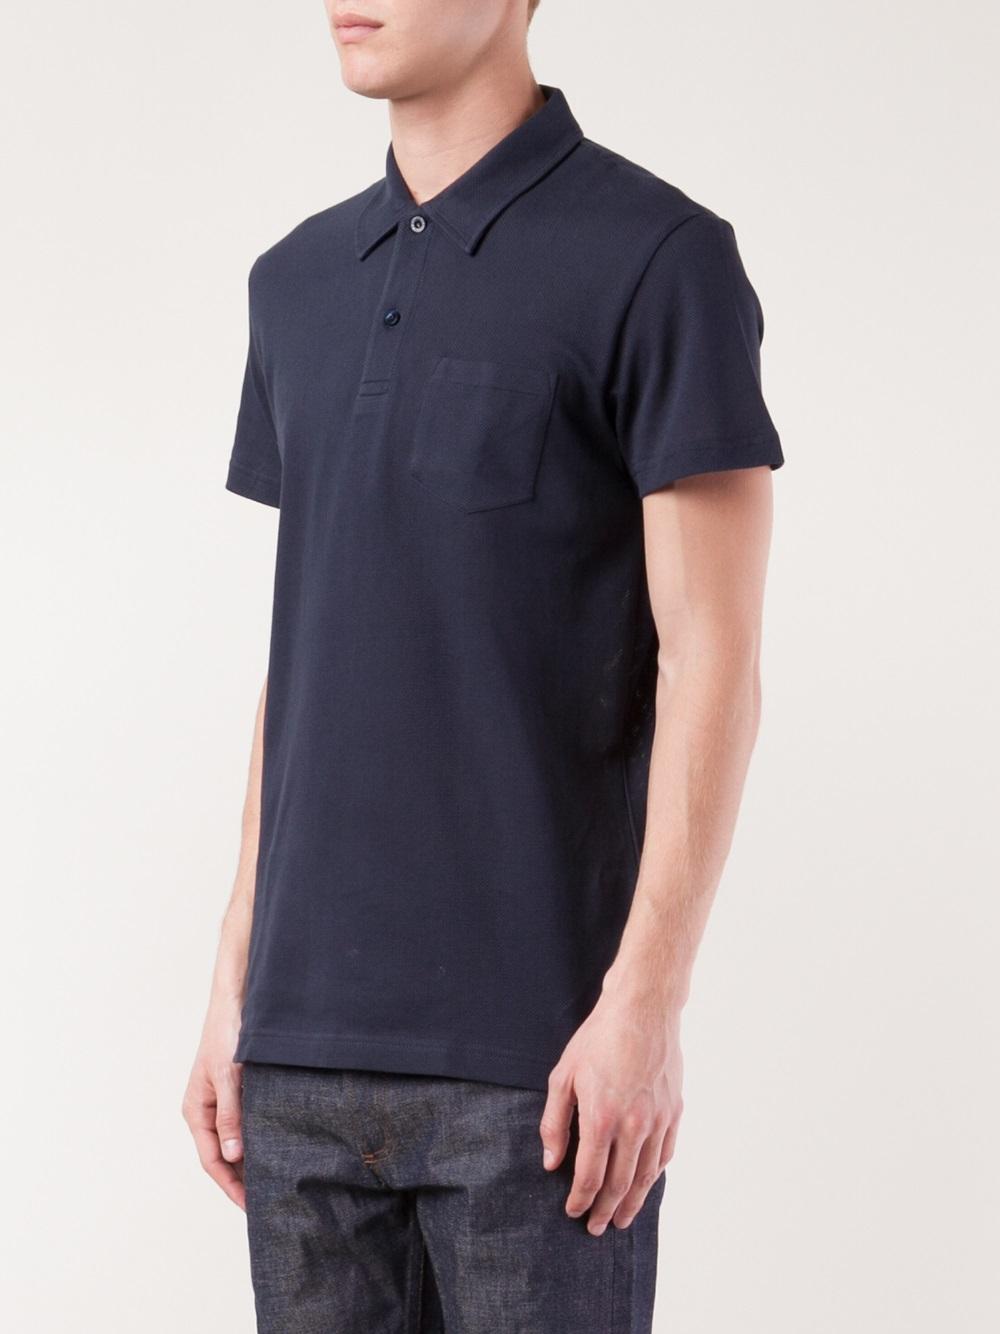 Lyst sunspel chest pocket polo shirt in blue for men for Men s polo shirts with chest pocket